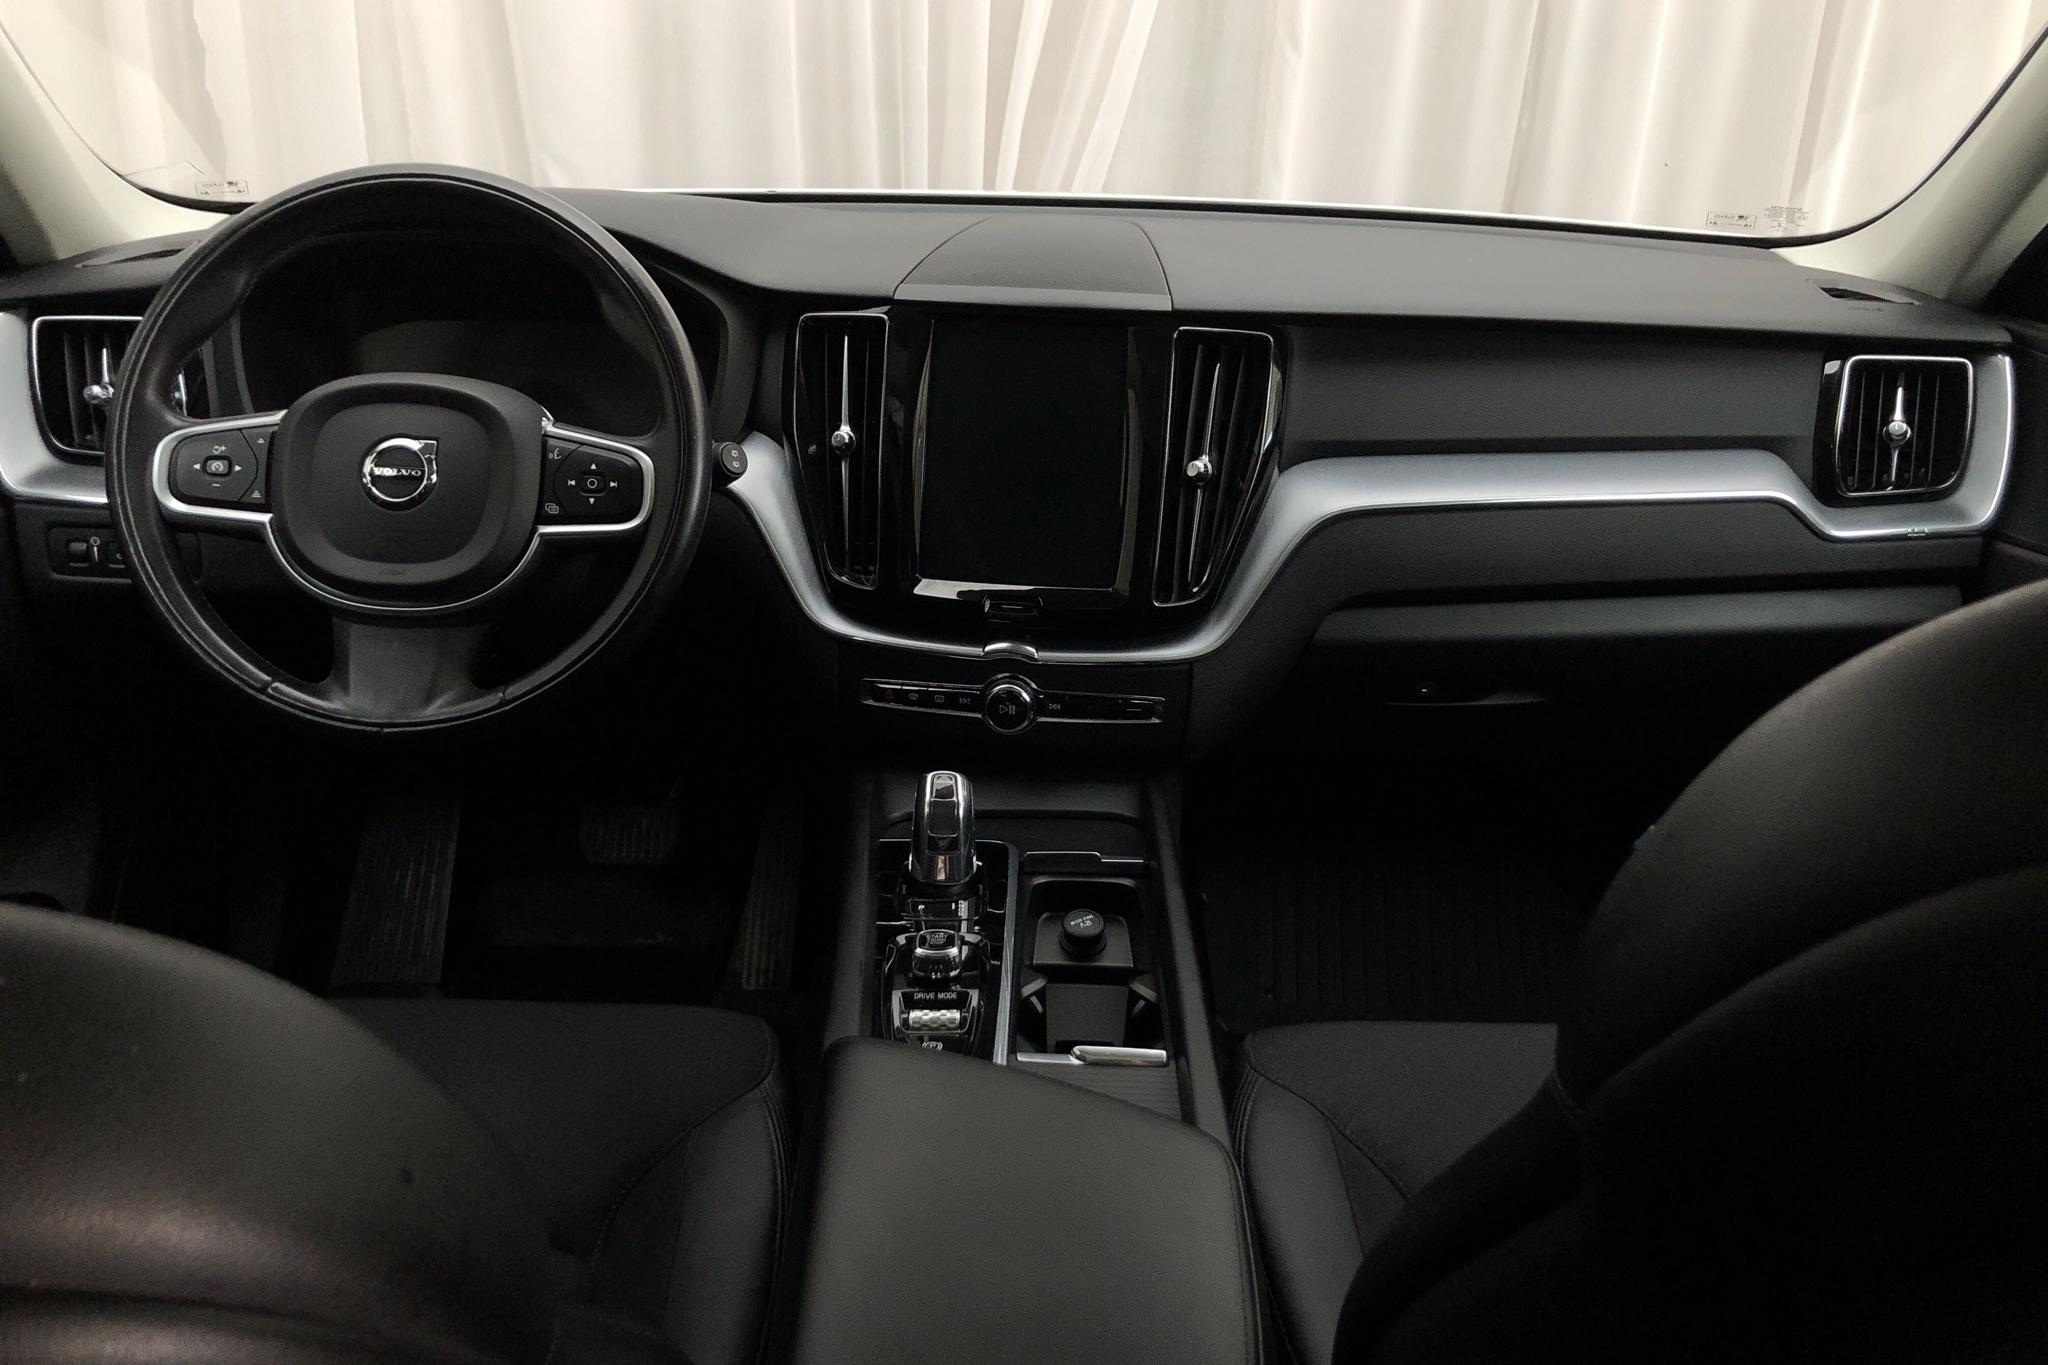 Volvo XC60 T8 AWD Twin Engine (390hk) - 104 500 km - Automatic - white - 2019